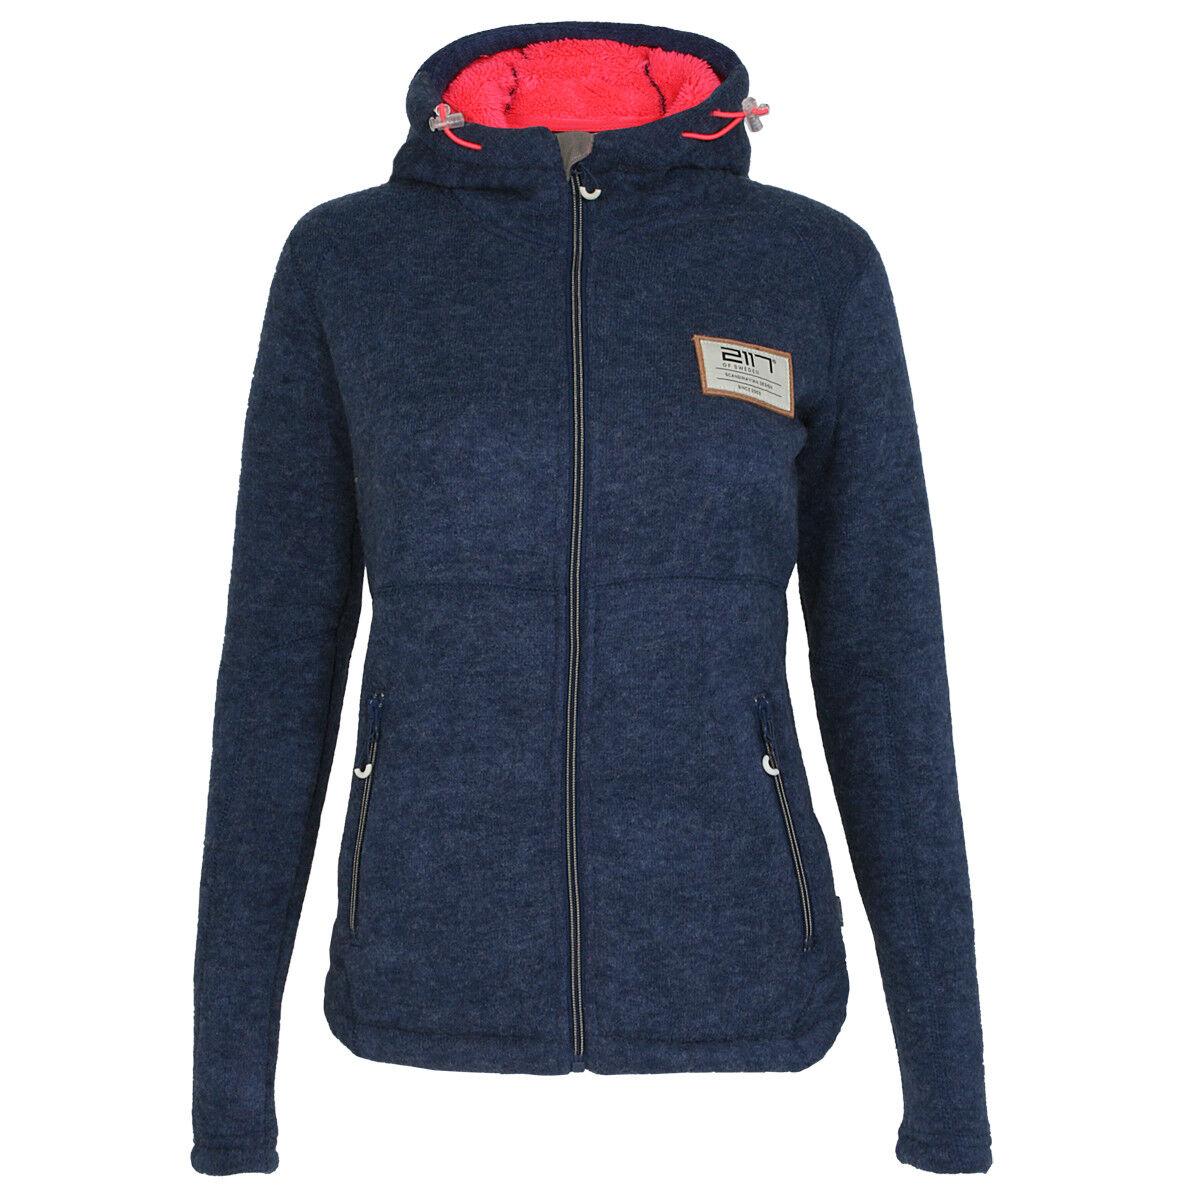 2117 of Sweden DaSie kapuzen Fleece Outdoor Jacke Borgholm Blau 7915994040